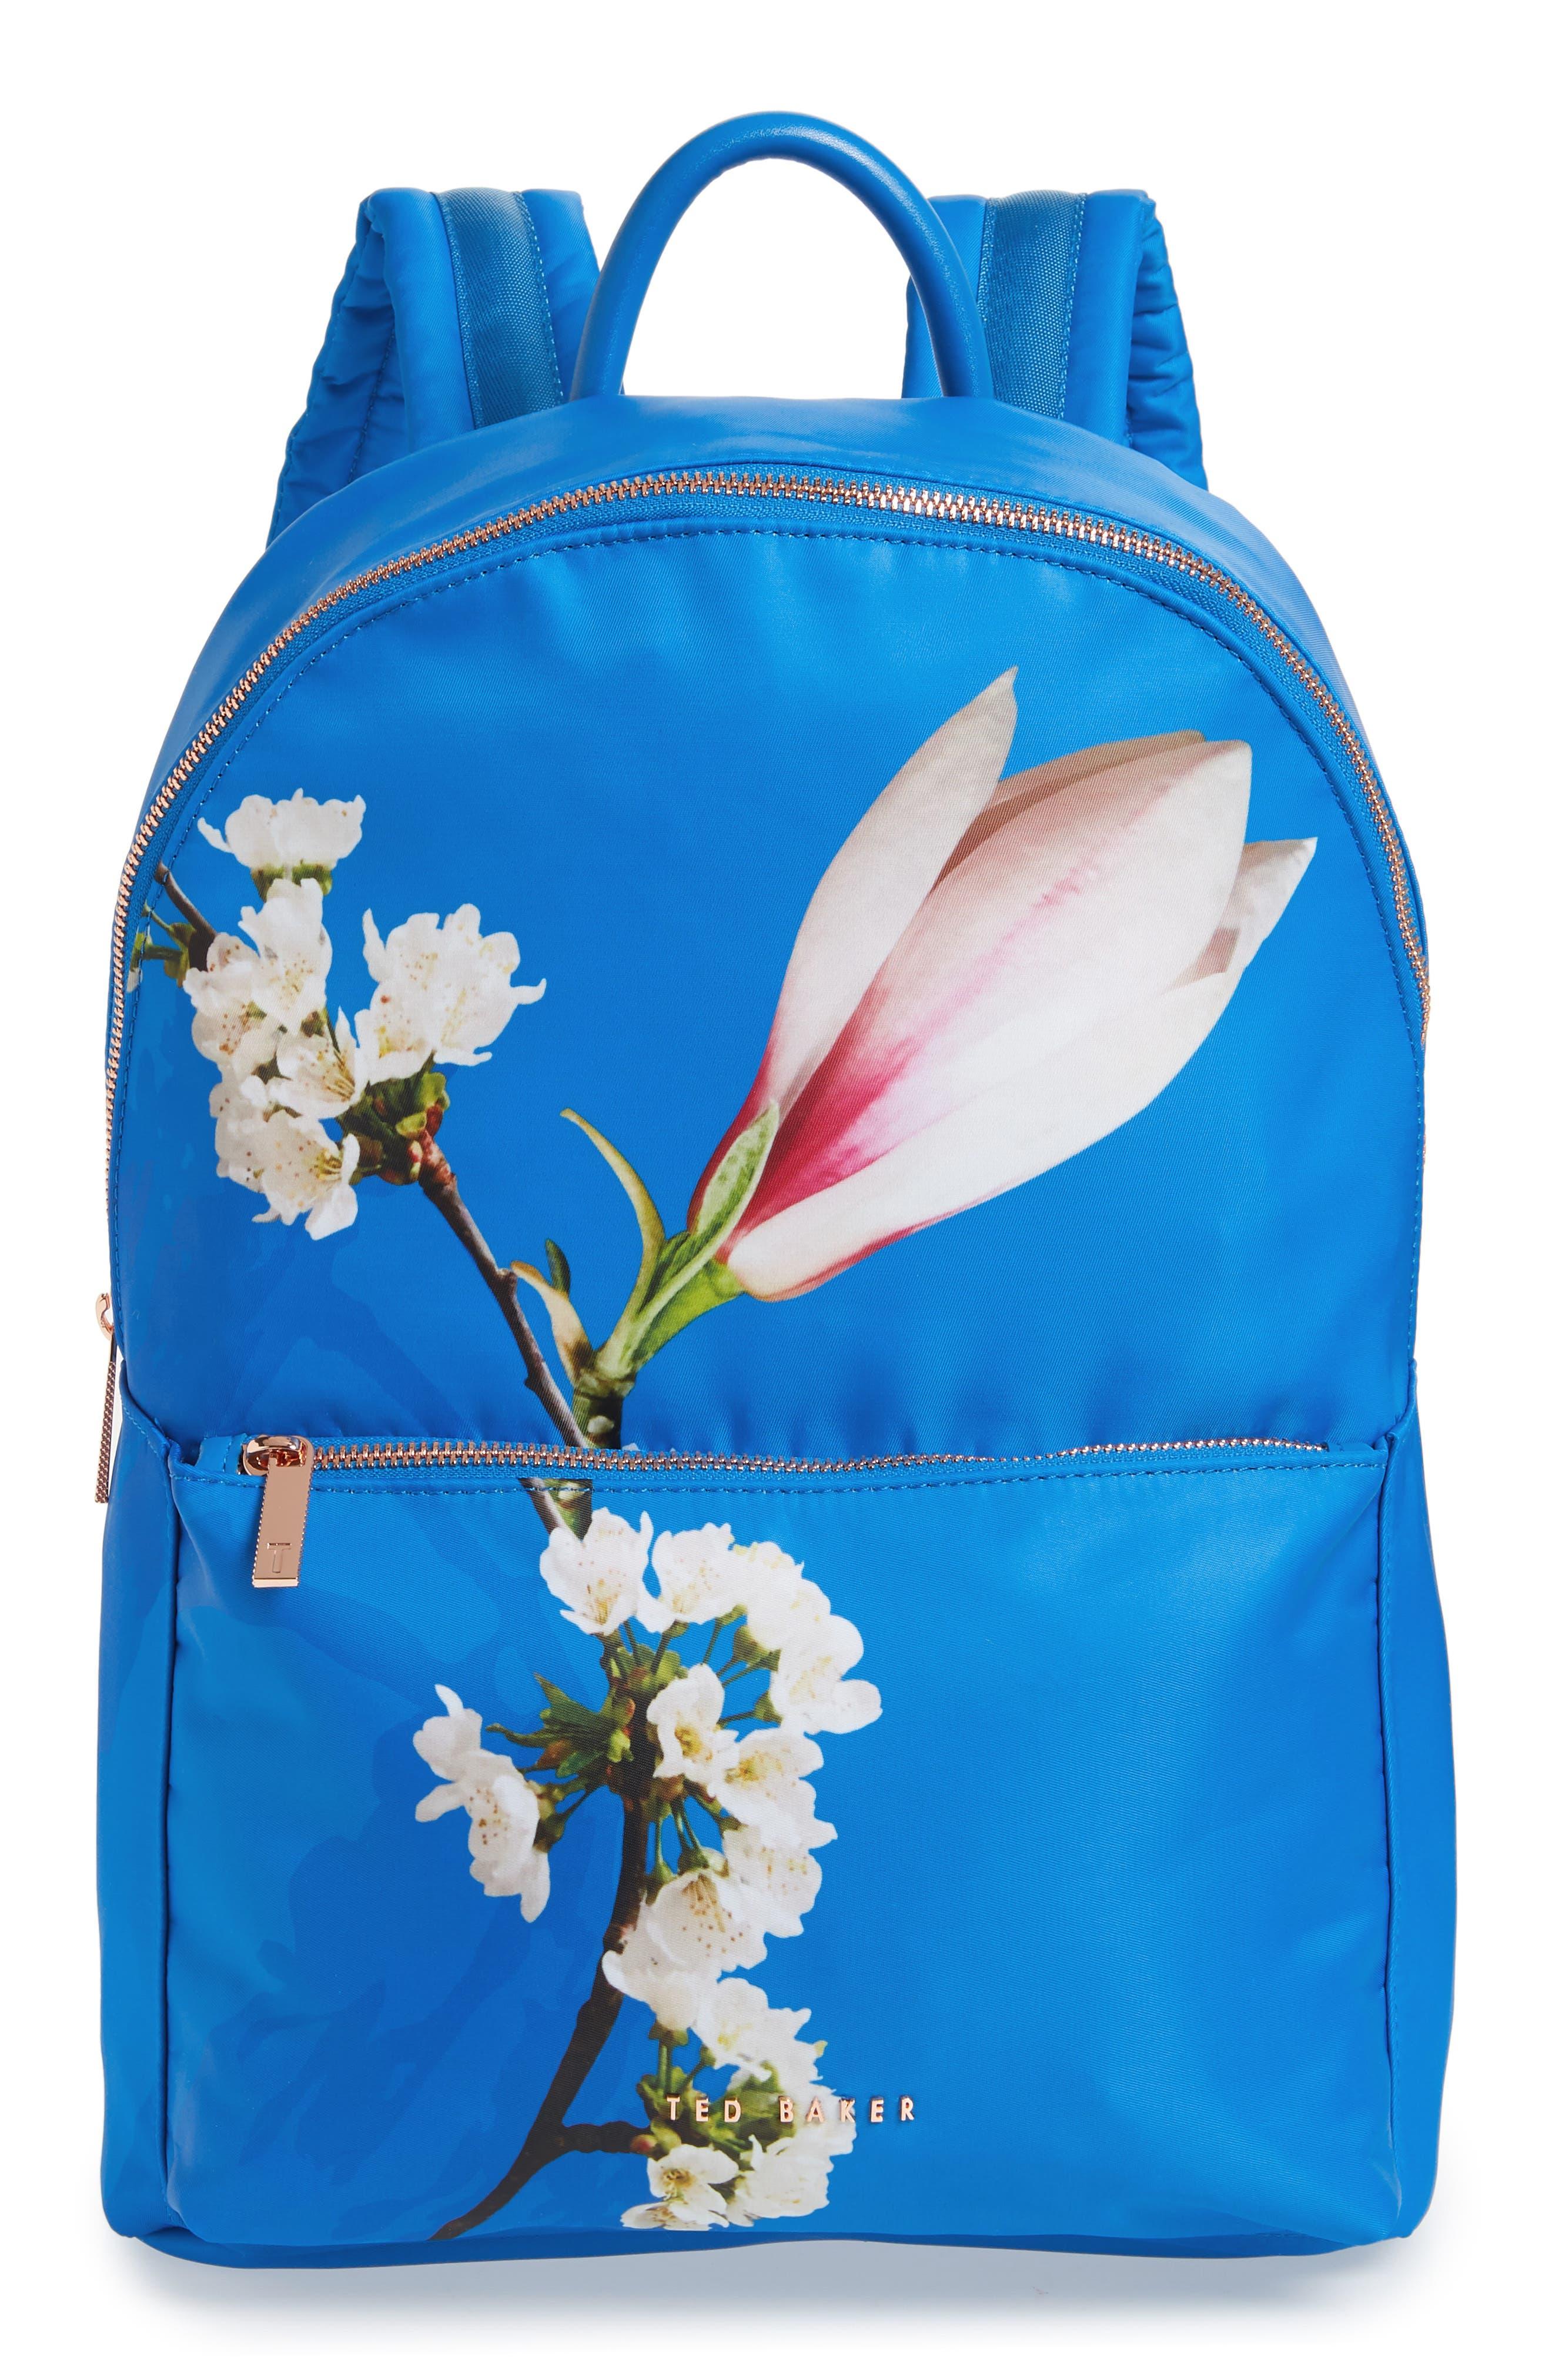 Harmony Print Backpack,                             Main thumbnail 1, color,                             BRIGHT BLUE